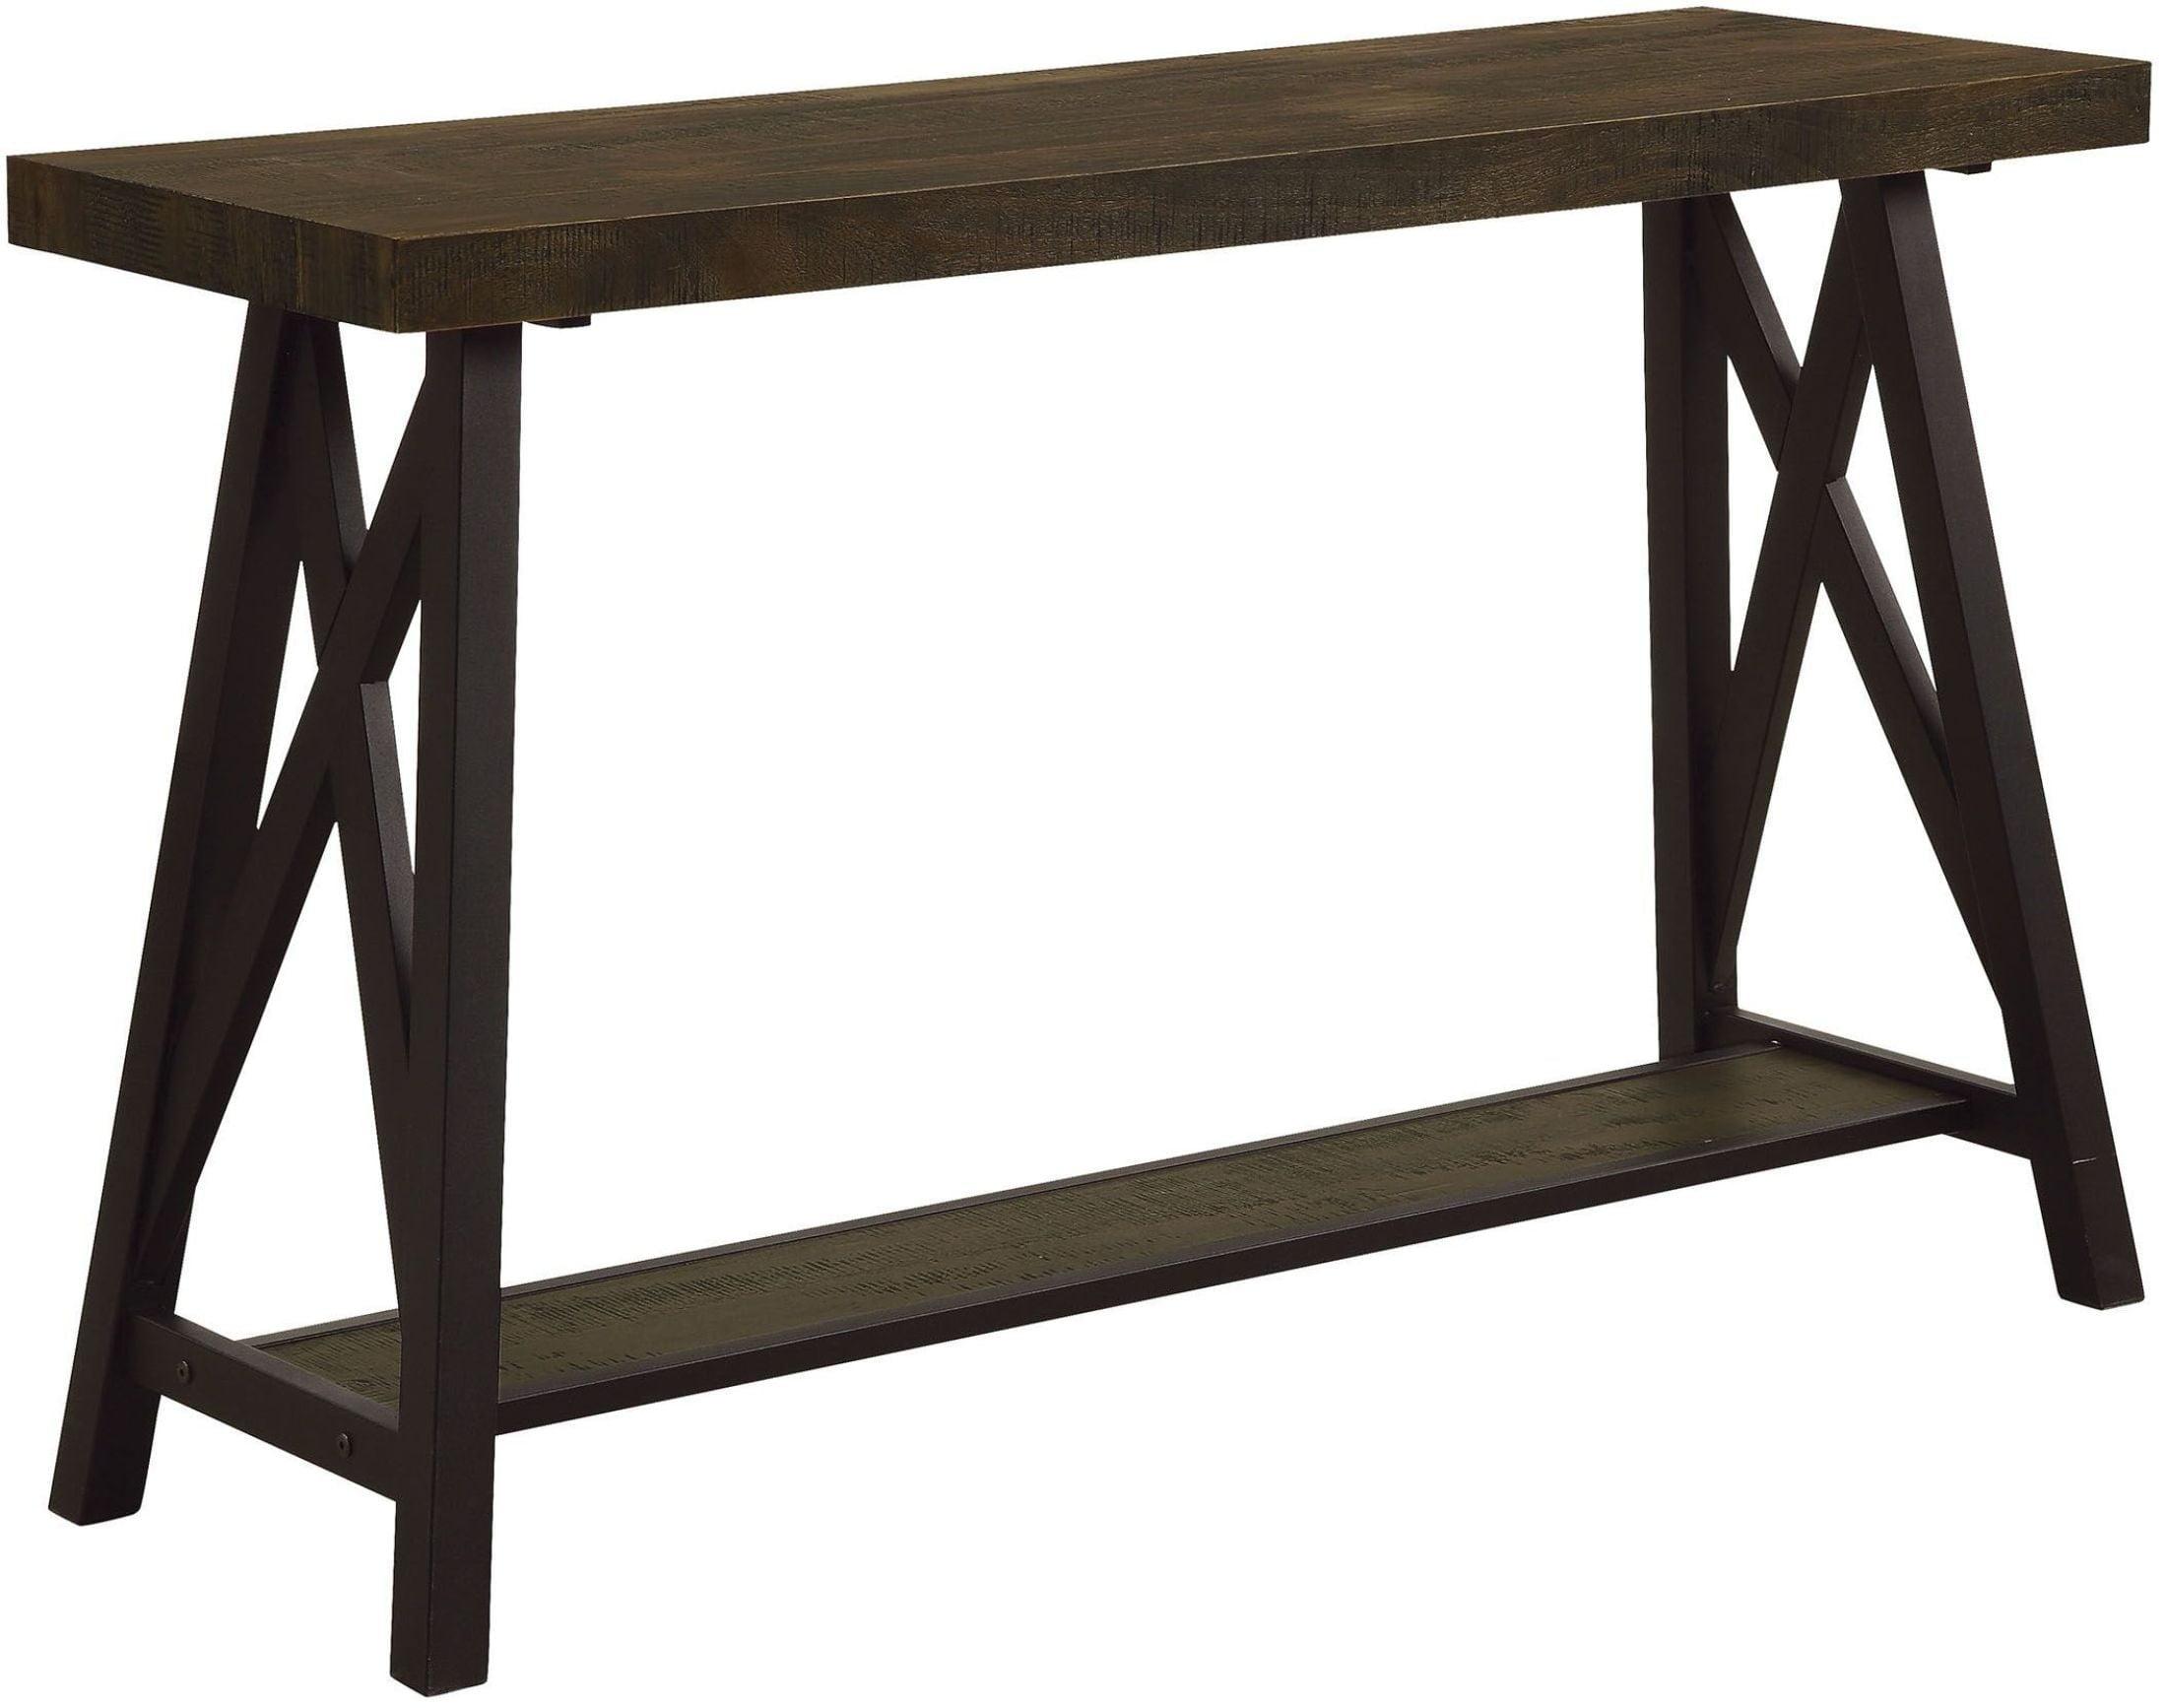 Tagan medium oak sofa table from furniture of america coleman tagan medium oak sofa table from furniture of america coleman furniture watchthetrailerfo